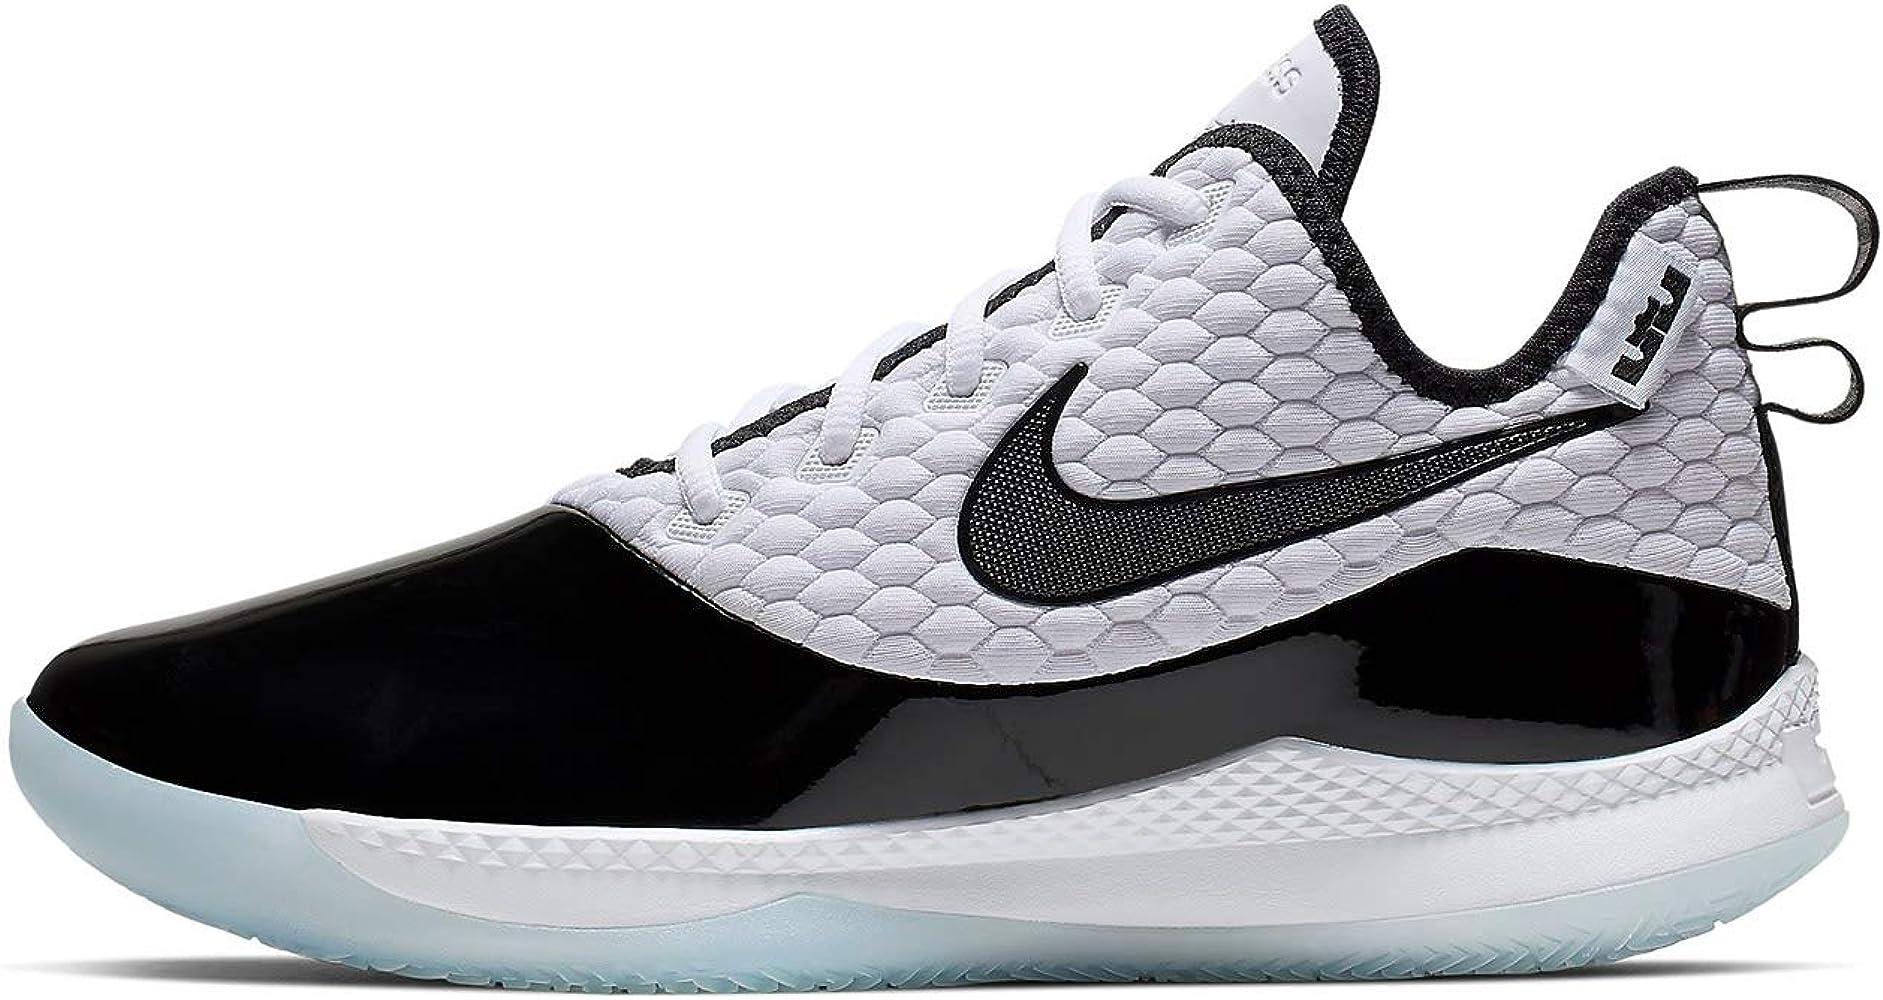 Nike Men's Lebron Witness III PRM